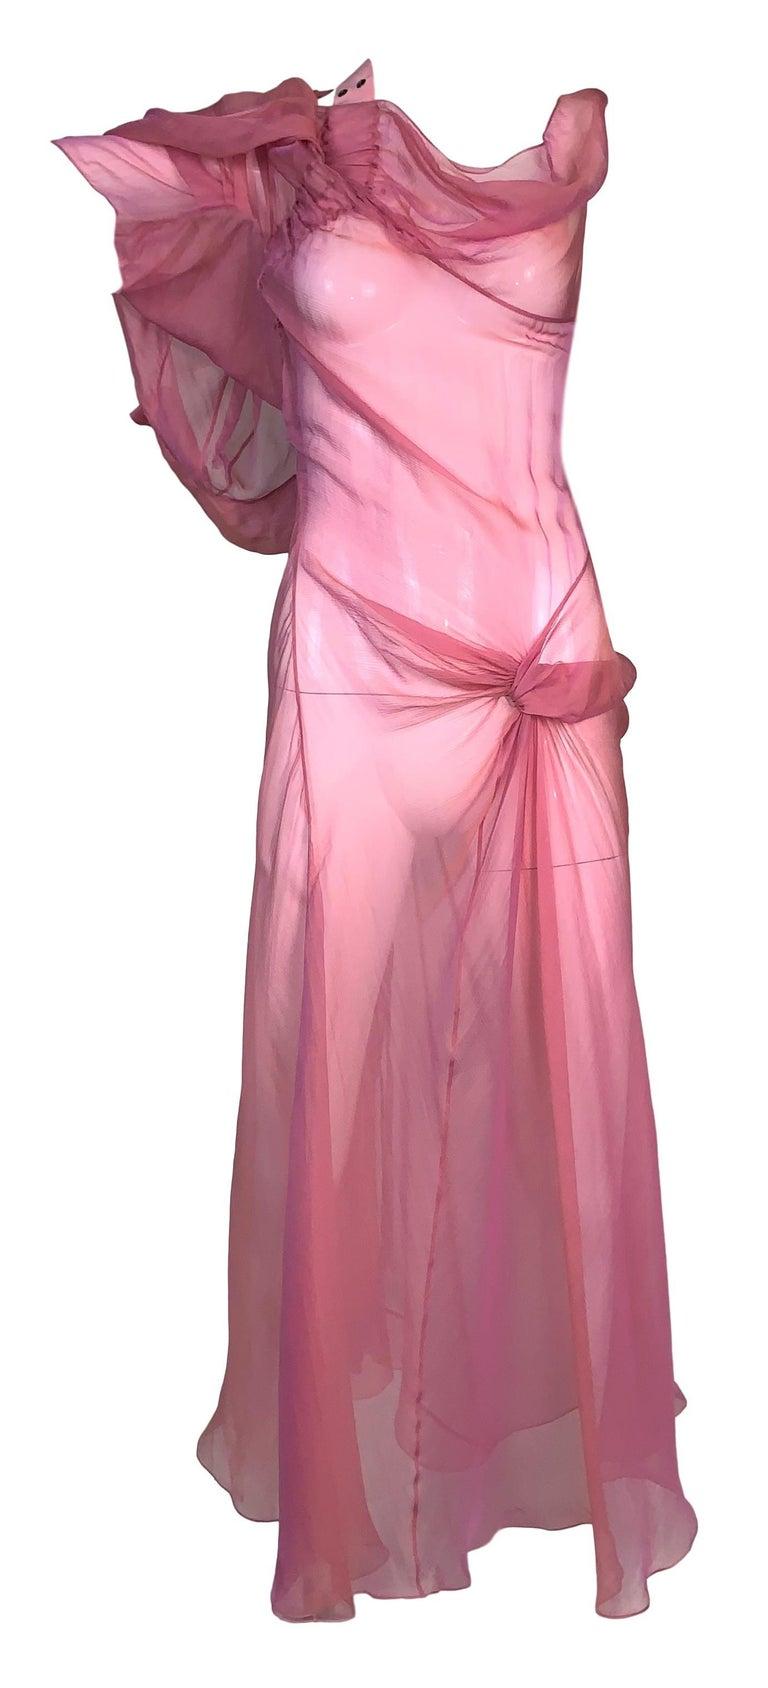 S/S 2002 Christian Dior John Galliano Runway Sheer Pink Hooded 2 Dresses In Good Condition In Yukon, OK